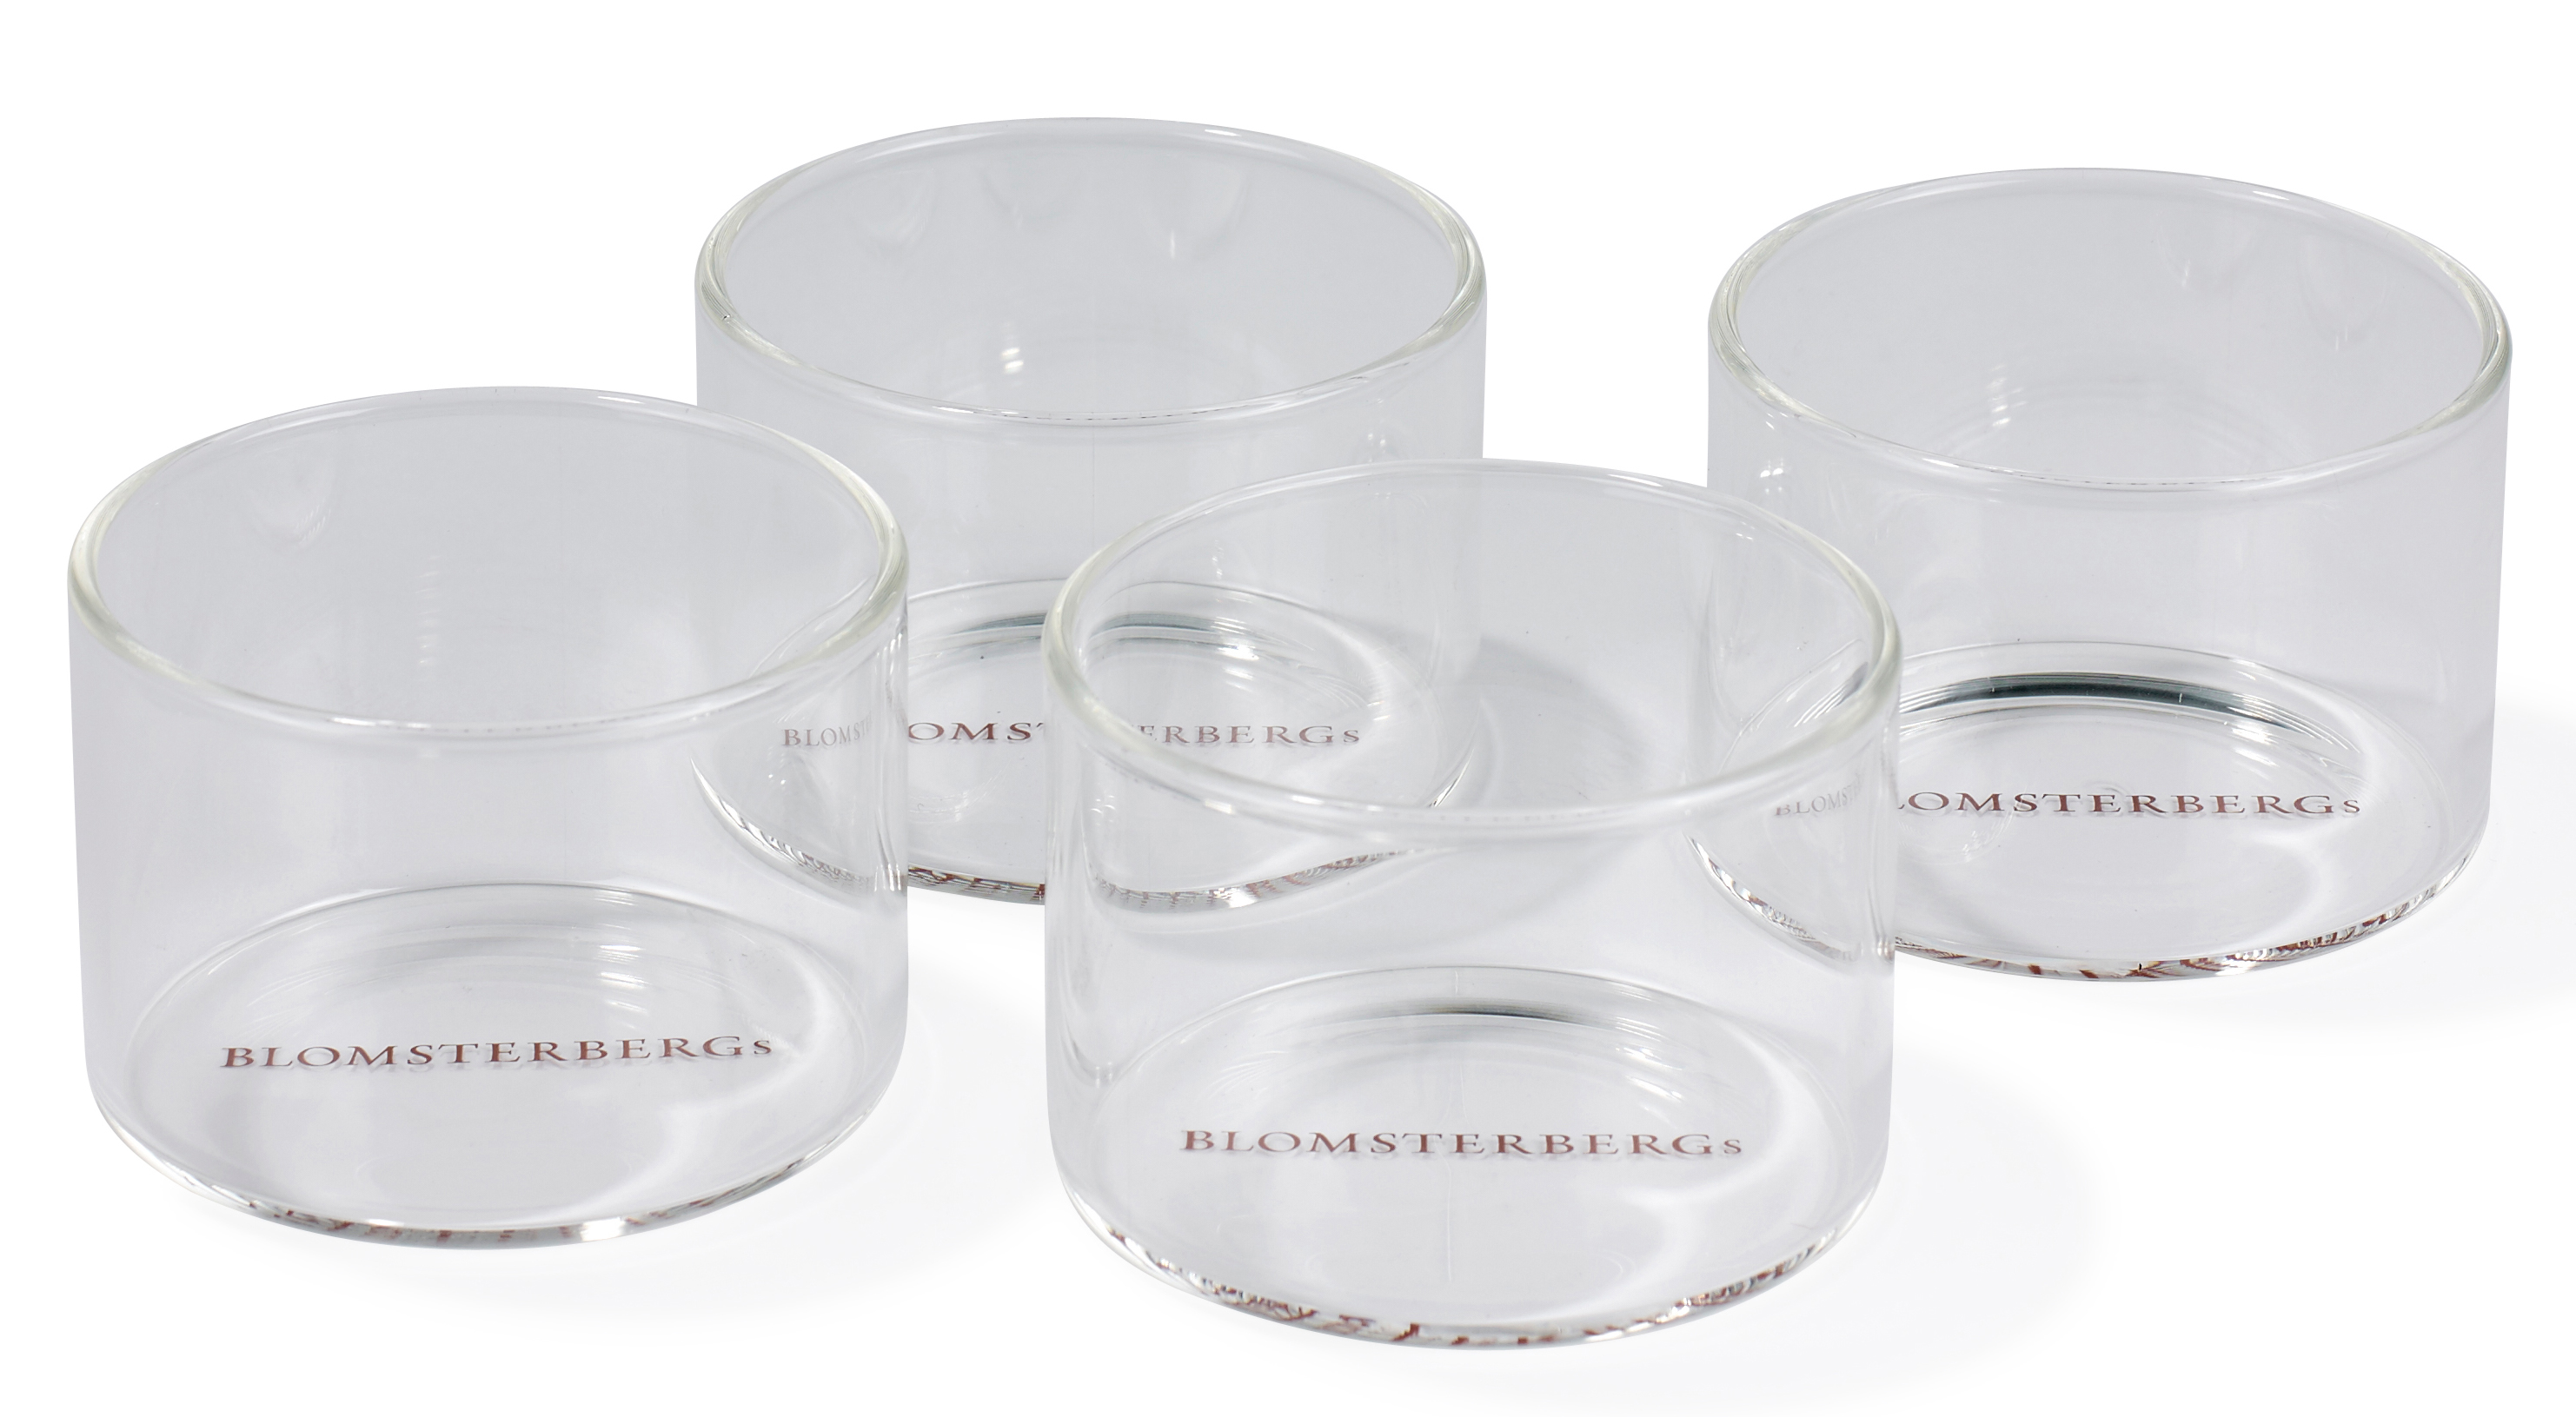 Blomsterbergs Serveringsglas Medium 4 st